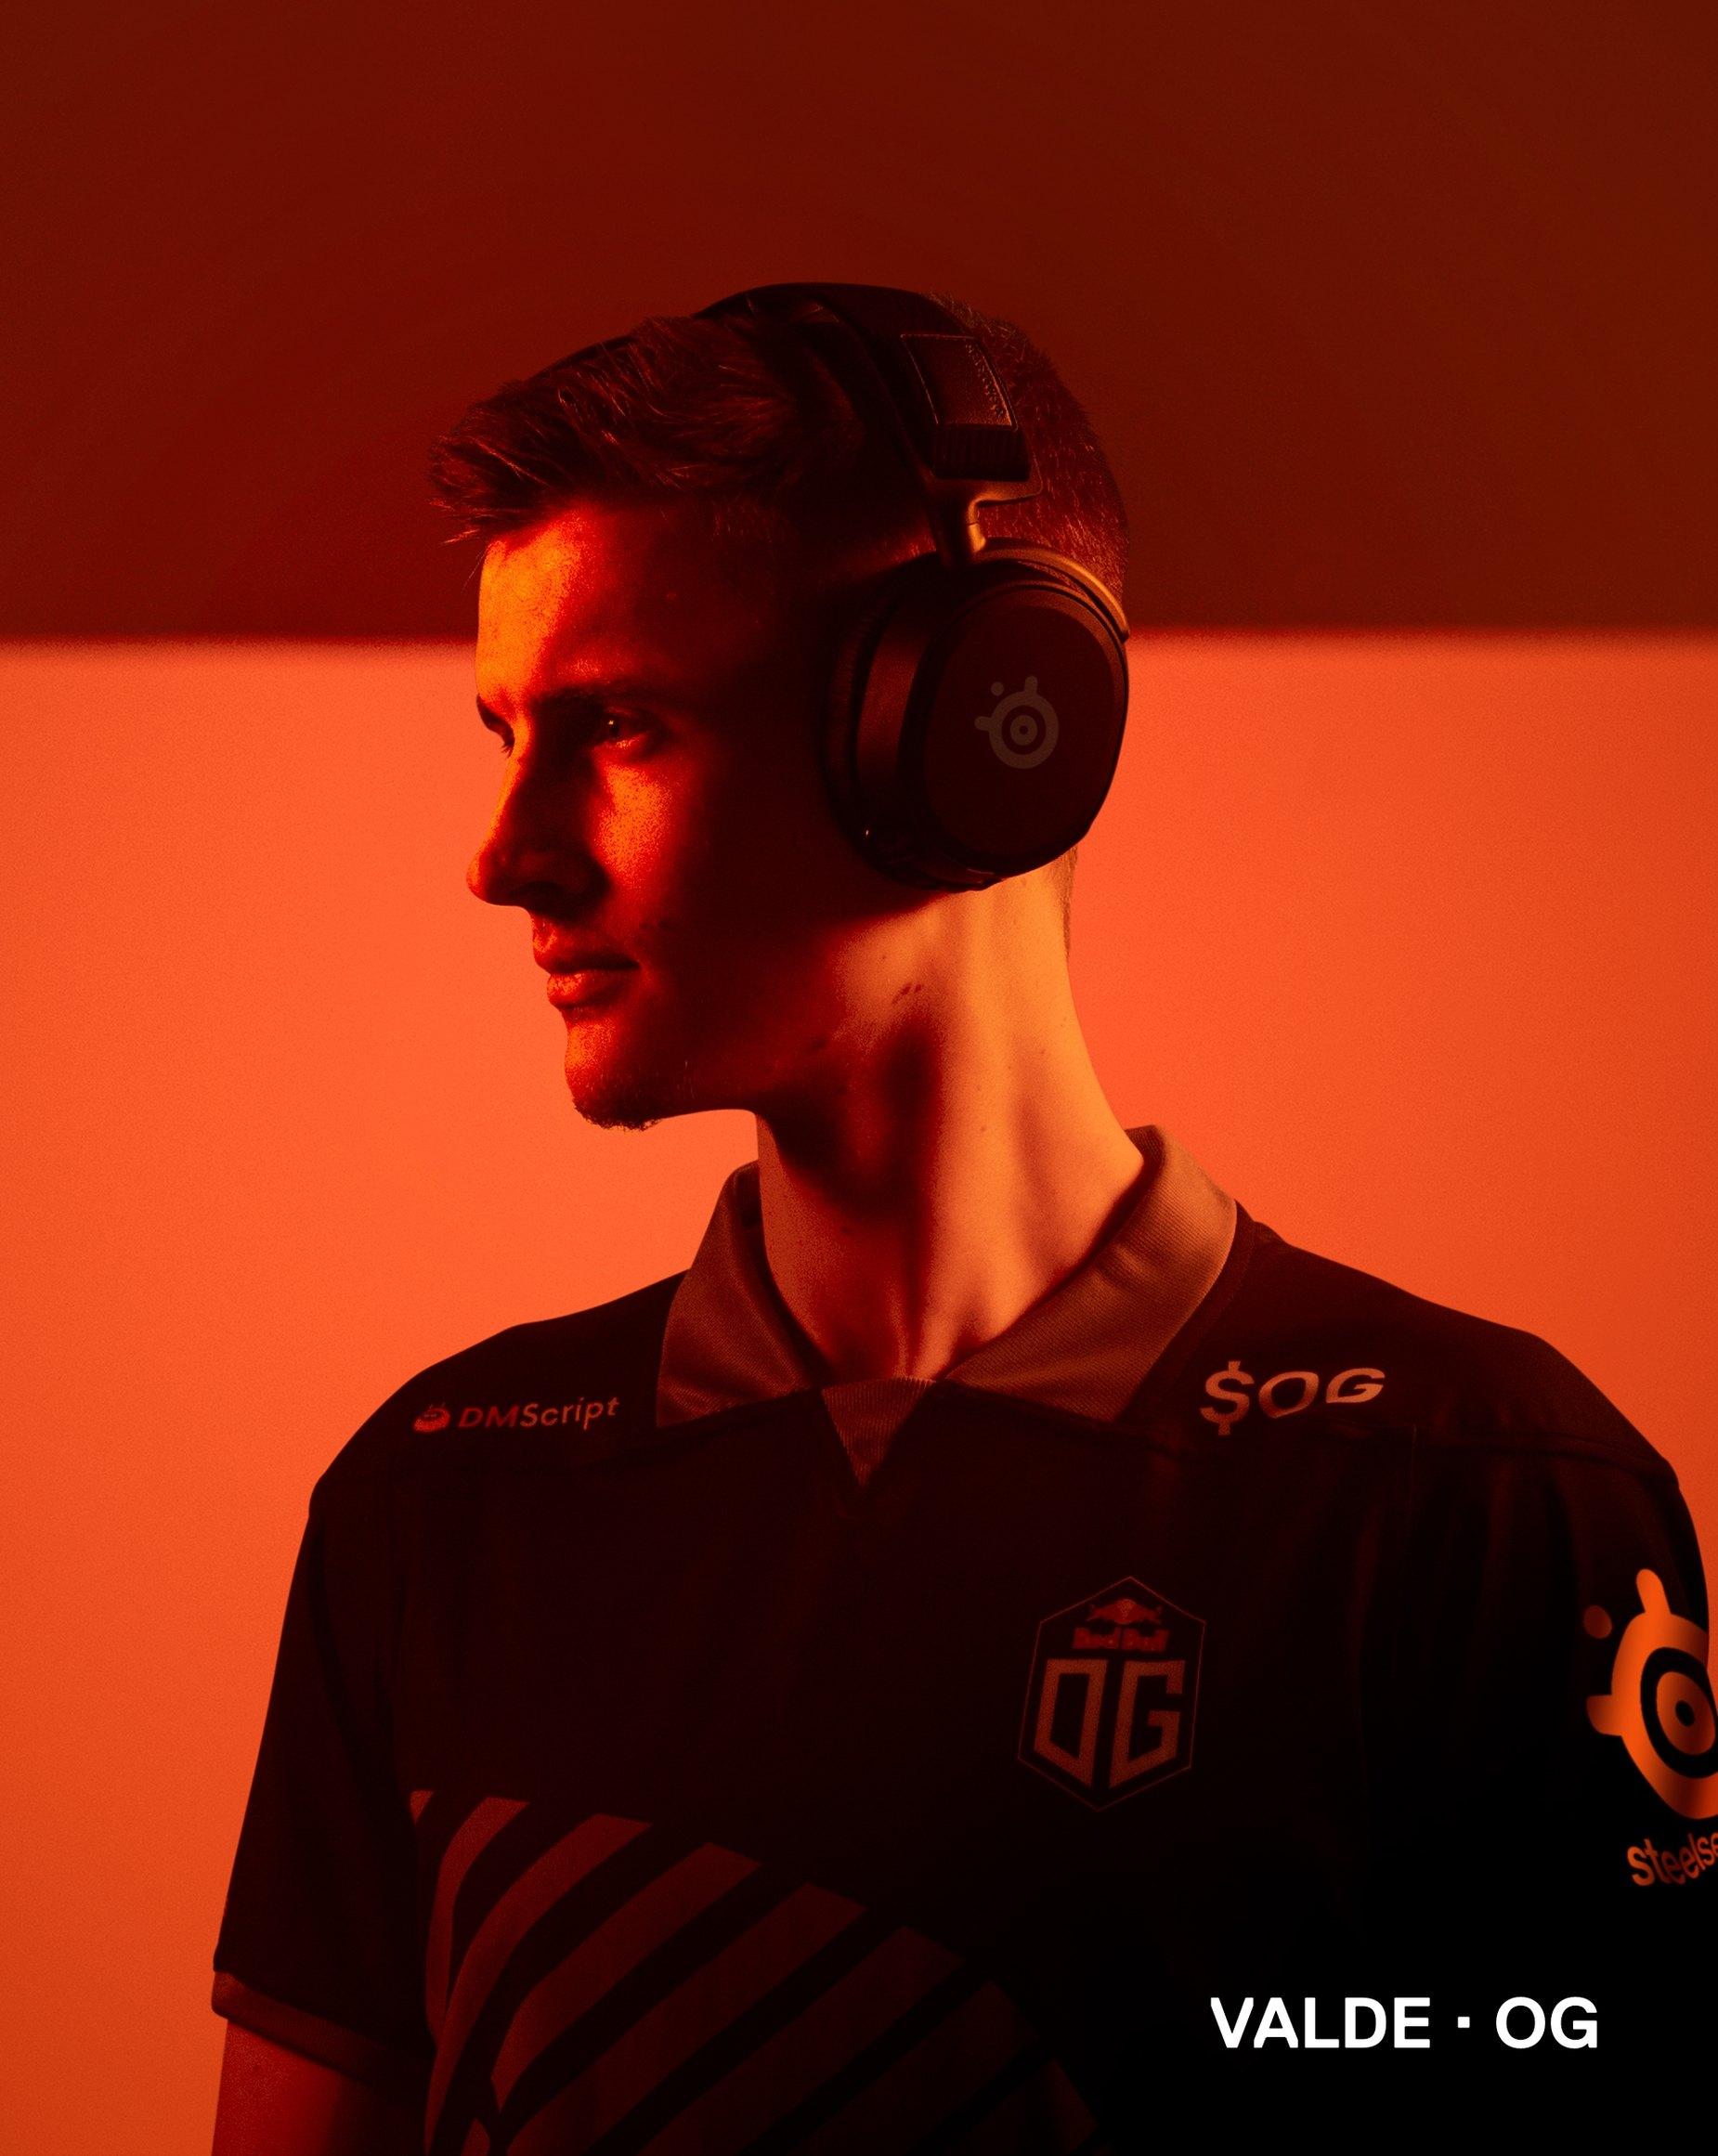 OG player Valde stands against an orange background wearing the Arctis Prime headset.